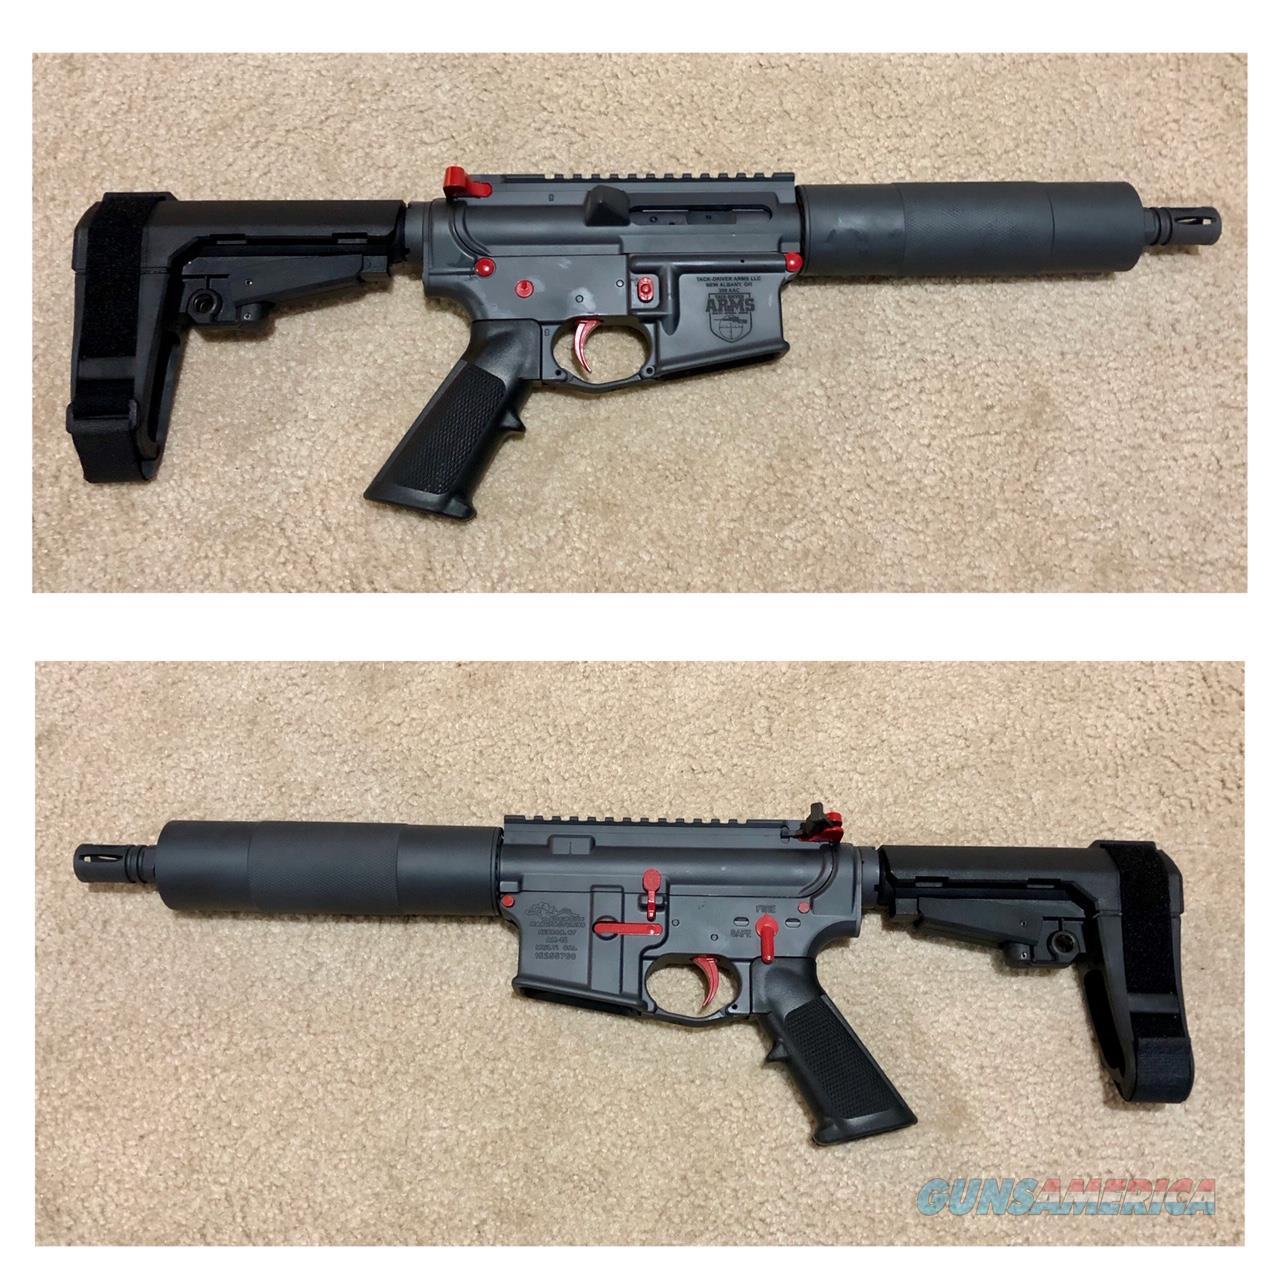 Custom Built 300 Blackout PISTOL w/ Custom Cerakote Scheme  Guns > Rifles > Custom Rifles > AR-15 Family